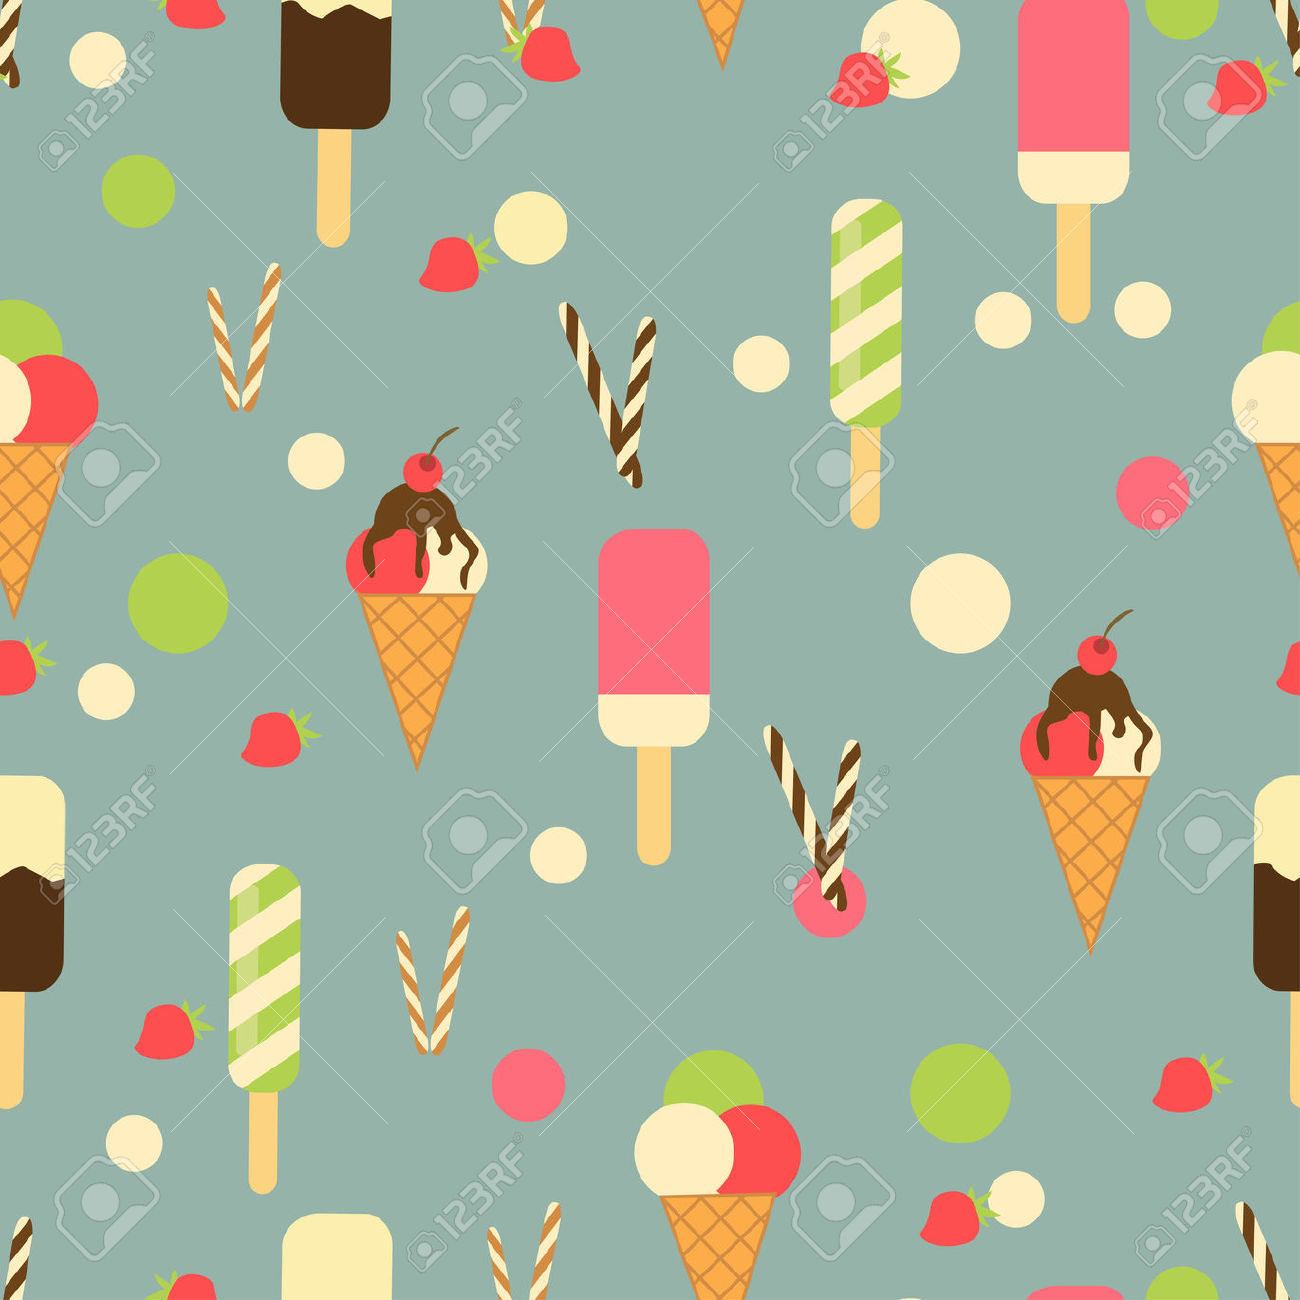 Ice Cream Clipart Wallpaper.